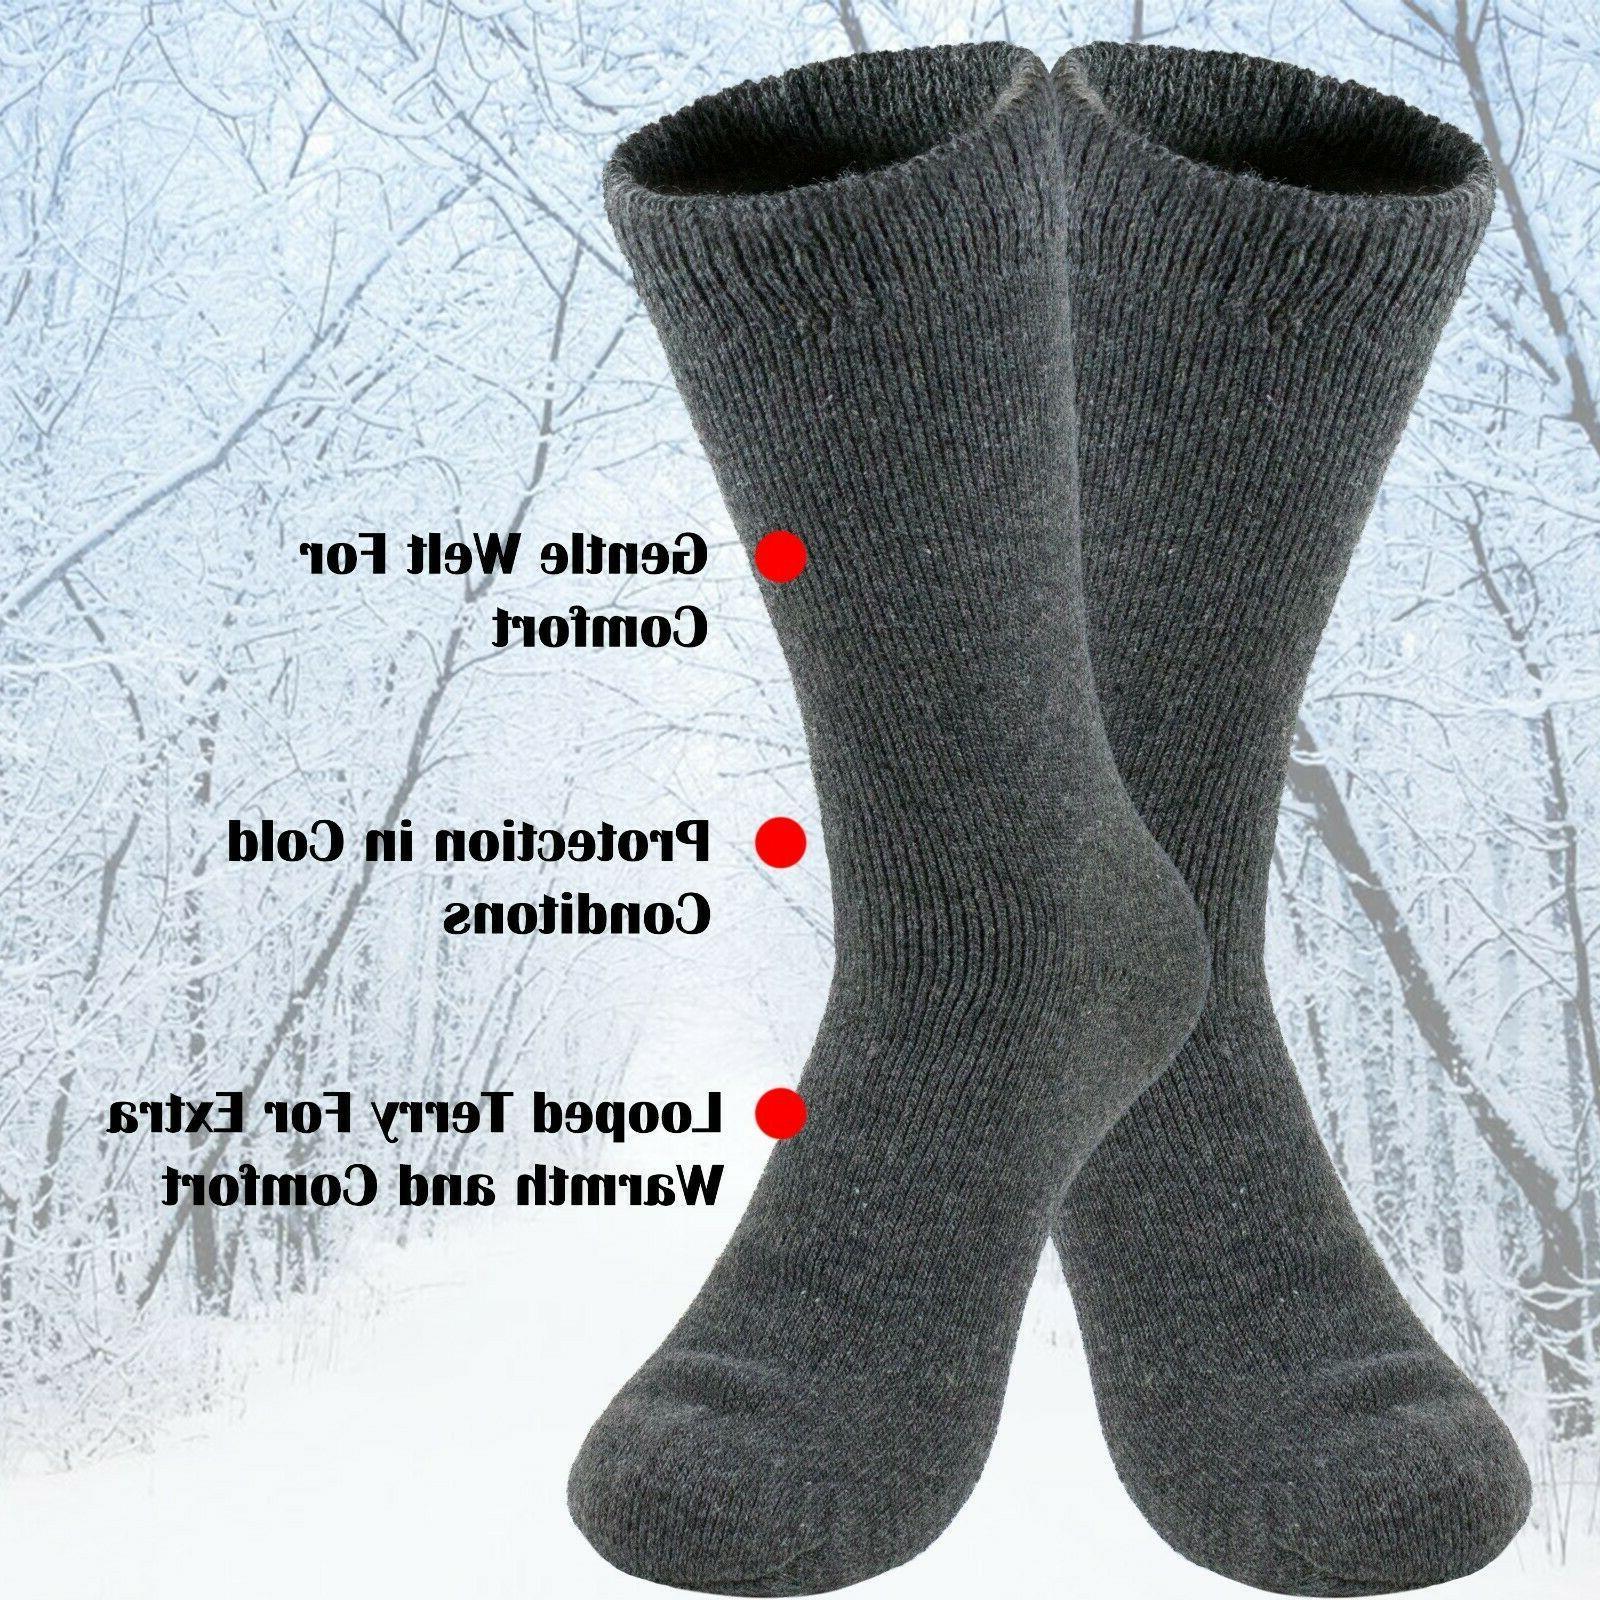 3 Mens Duty Boot Socks Winter Heated Work Crew Sox 9-13